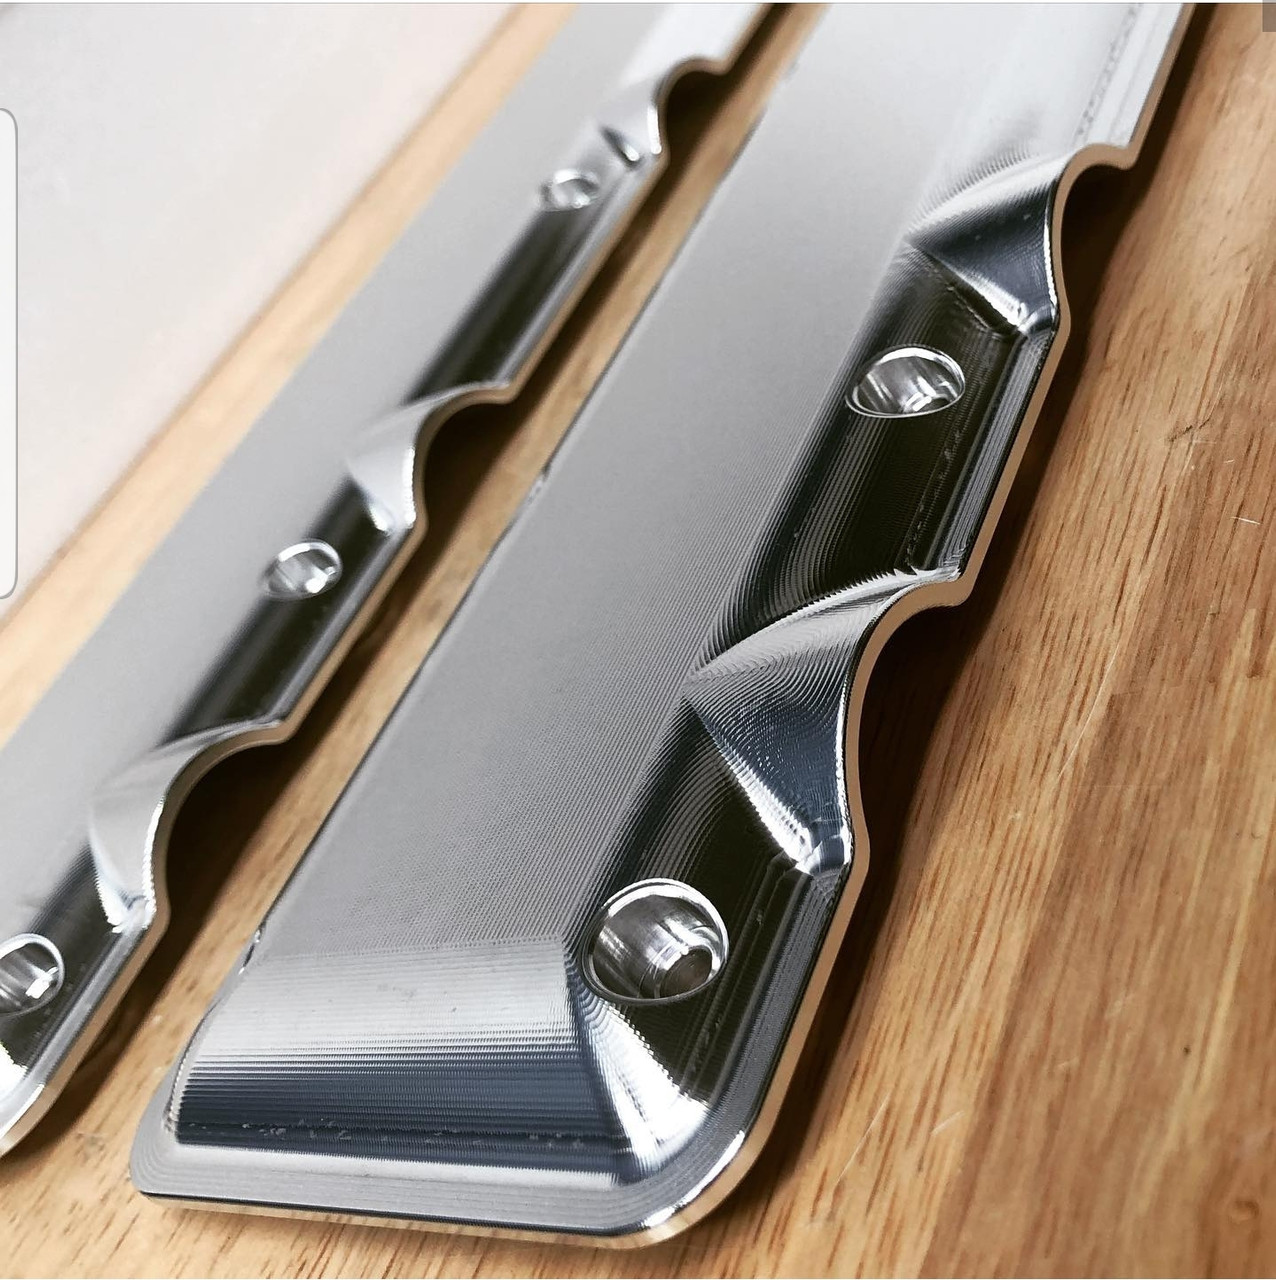 LSX LSA Billet Coil Covers | Raw Finish